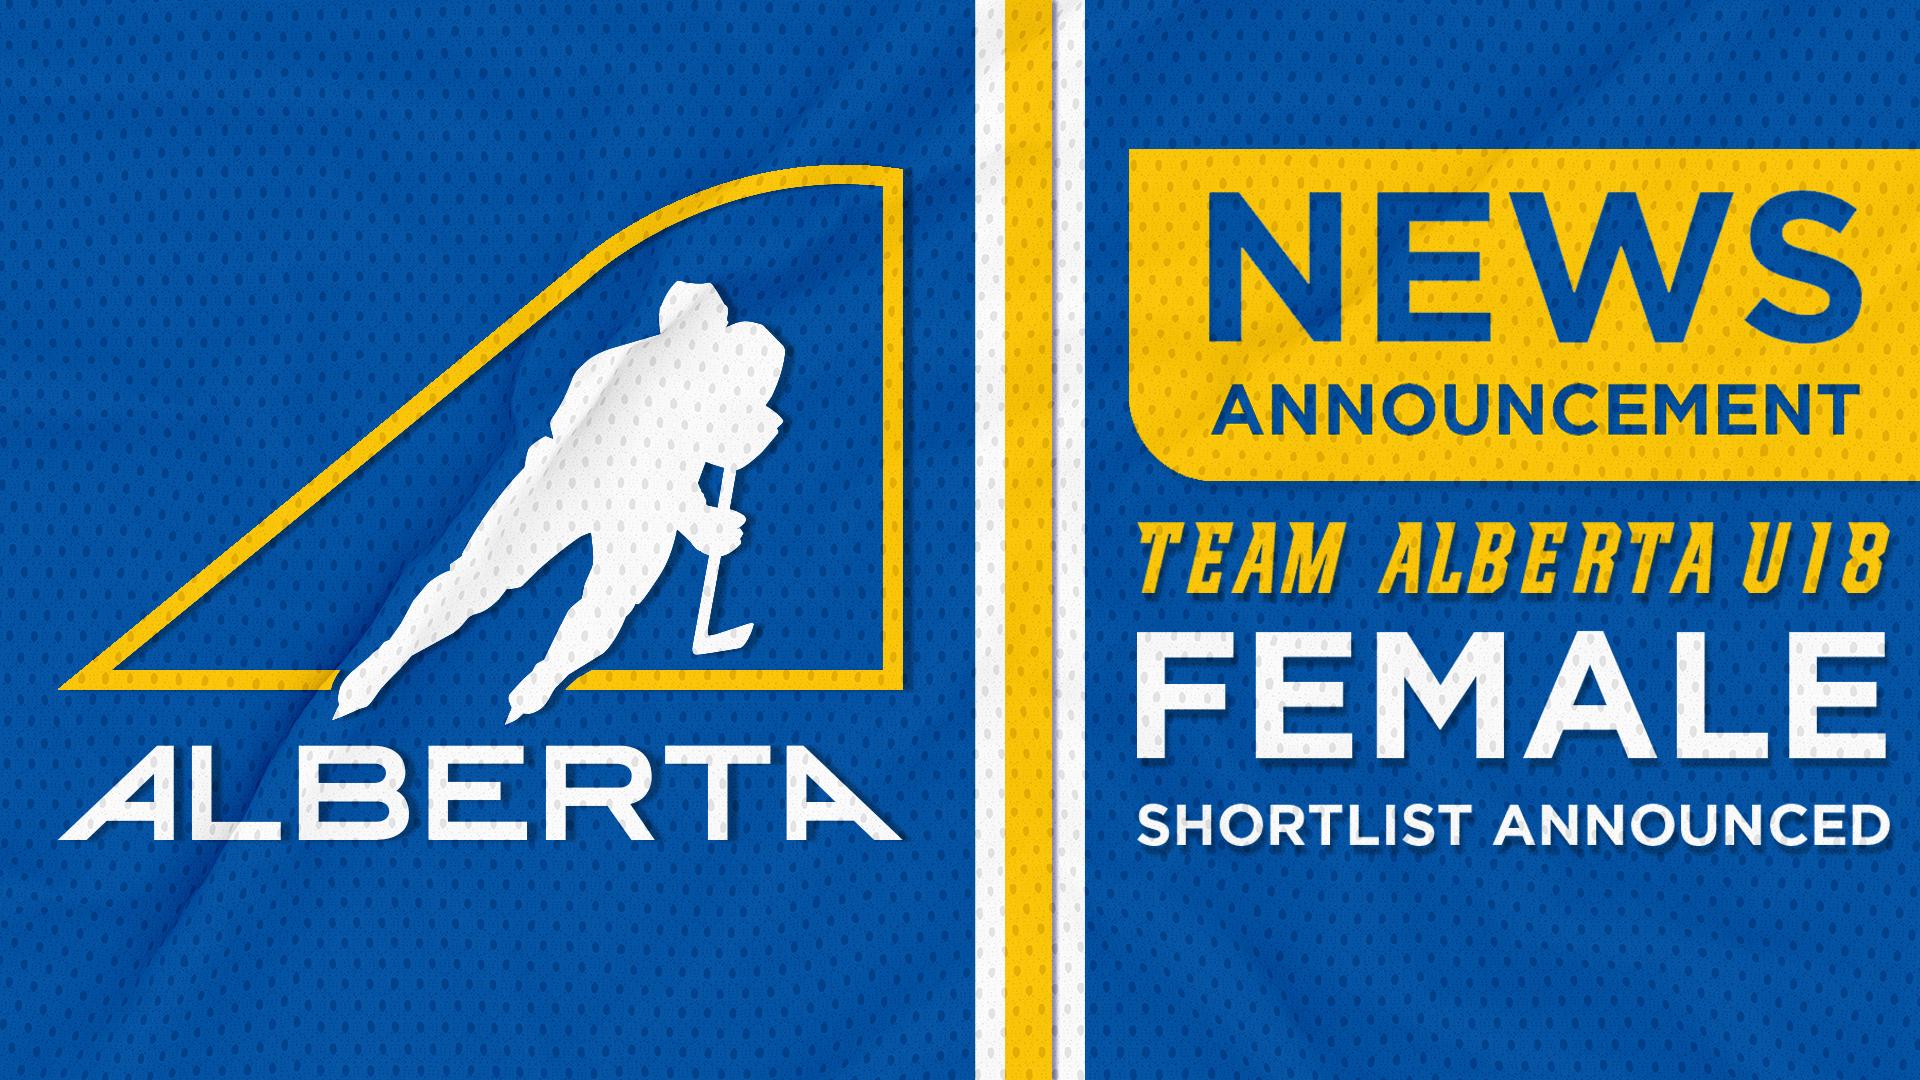 Hockey-Alberta-Twitter-Ad-Steve-Mack-2019.png